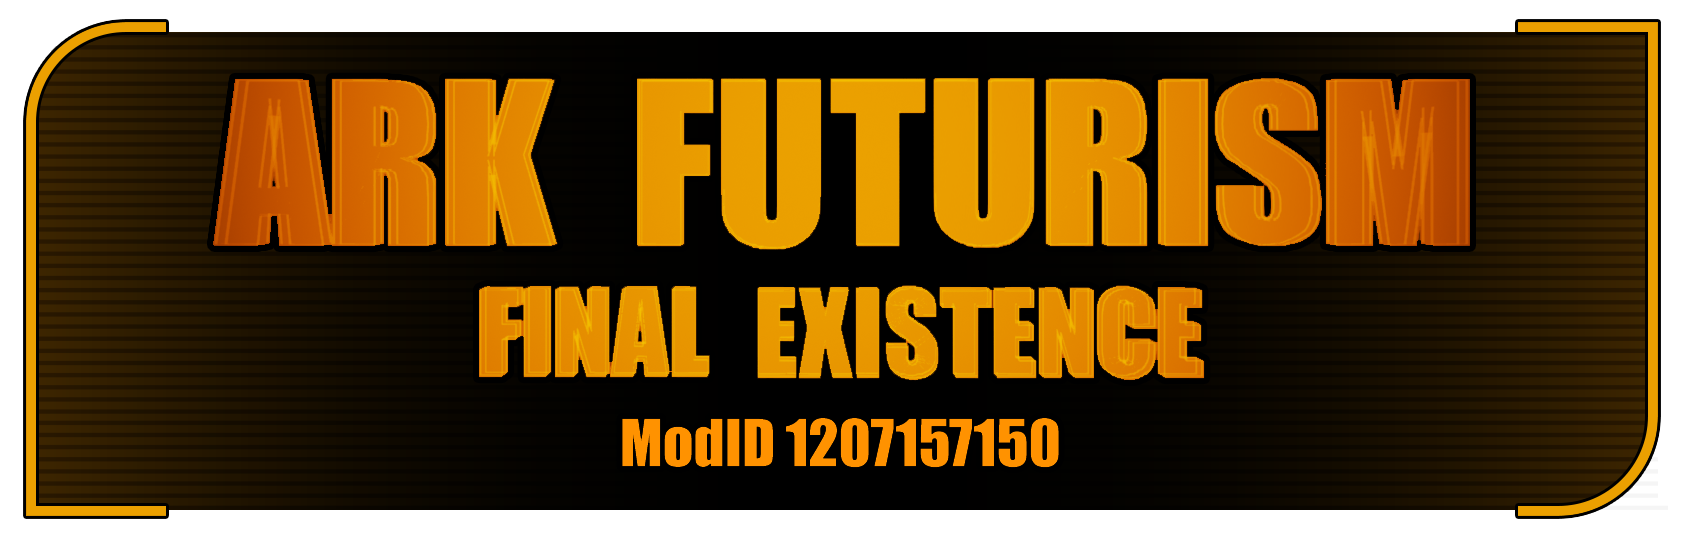 Steam Workshop :: Ark Futurism Final Existence